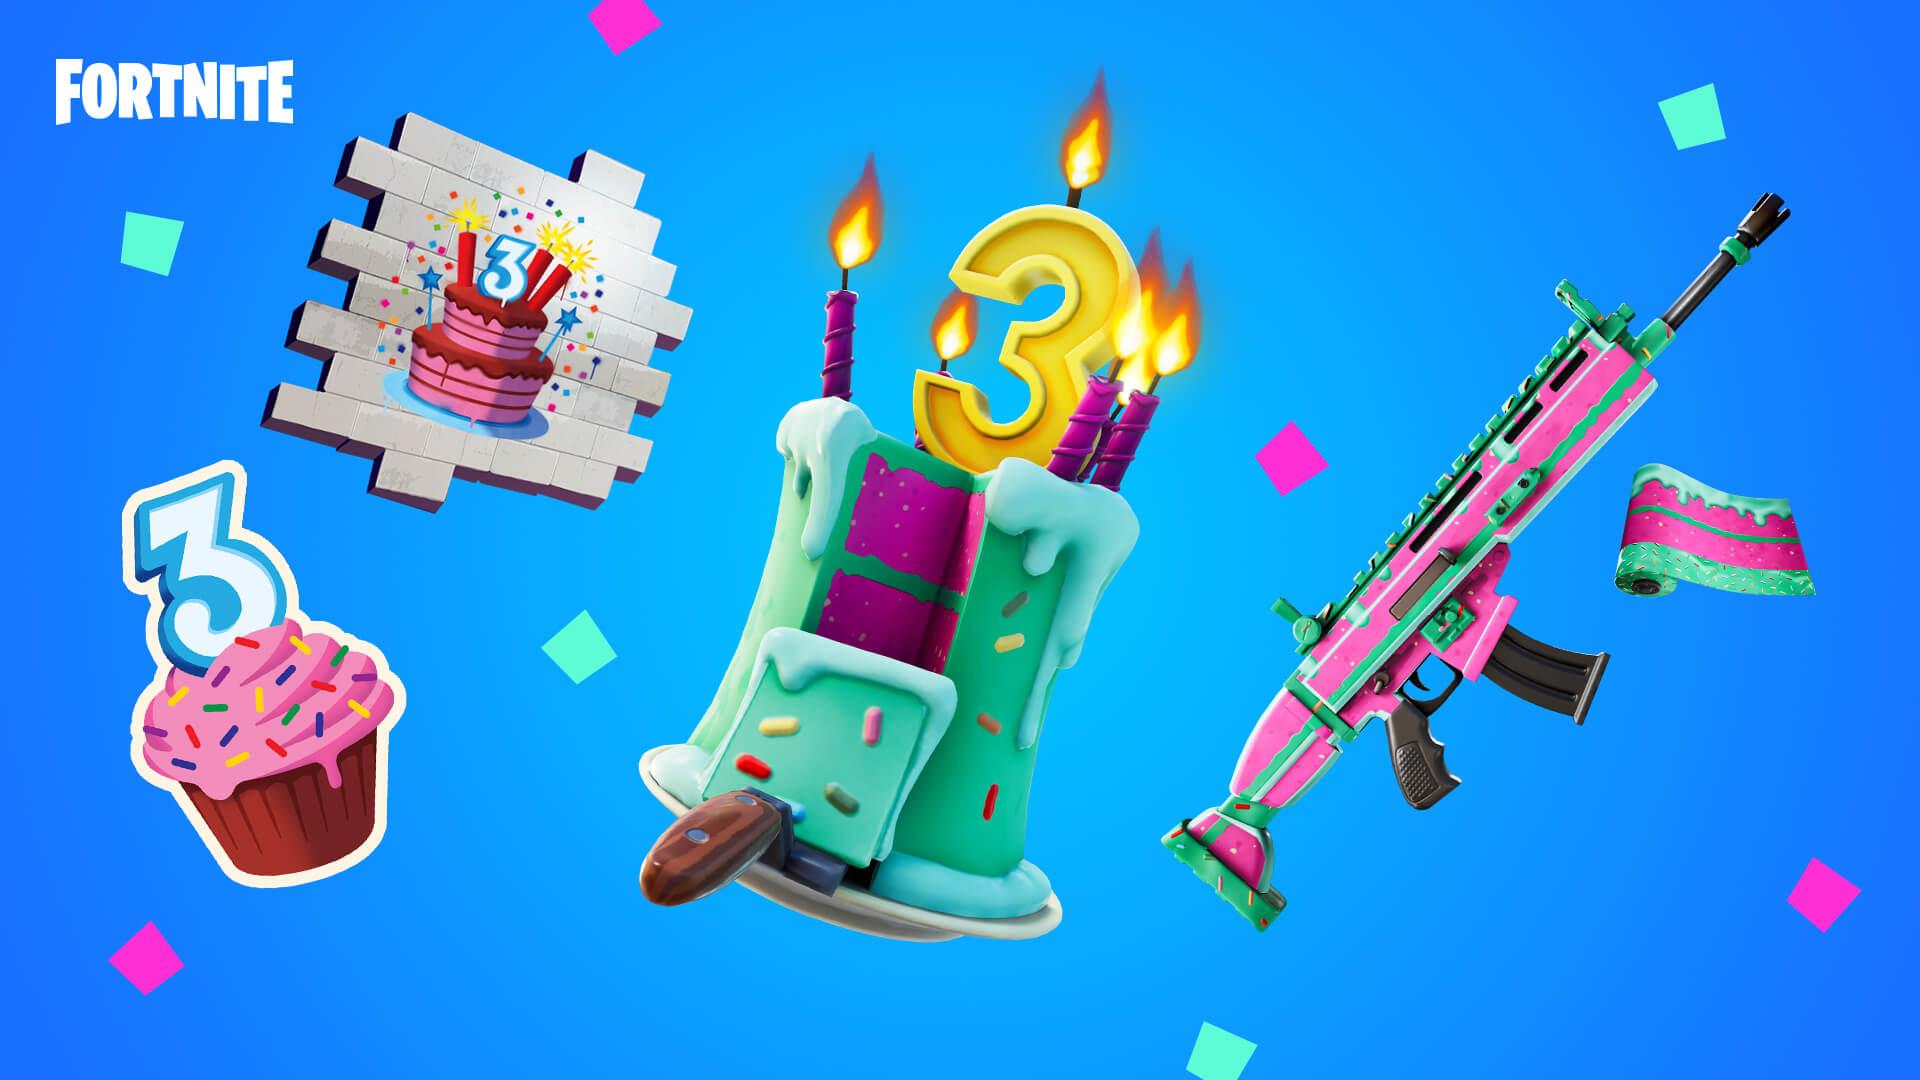 14BR BirthdayBash ChallengeRewards Social